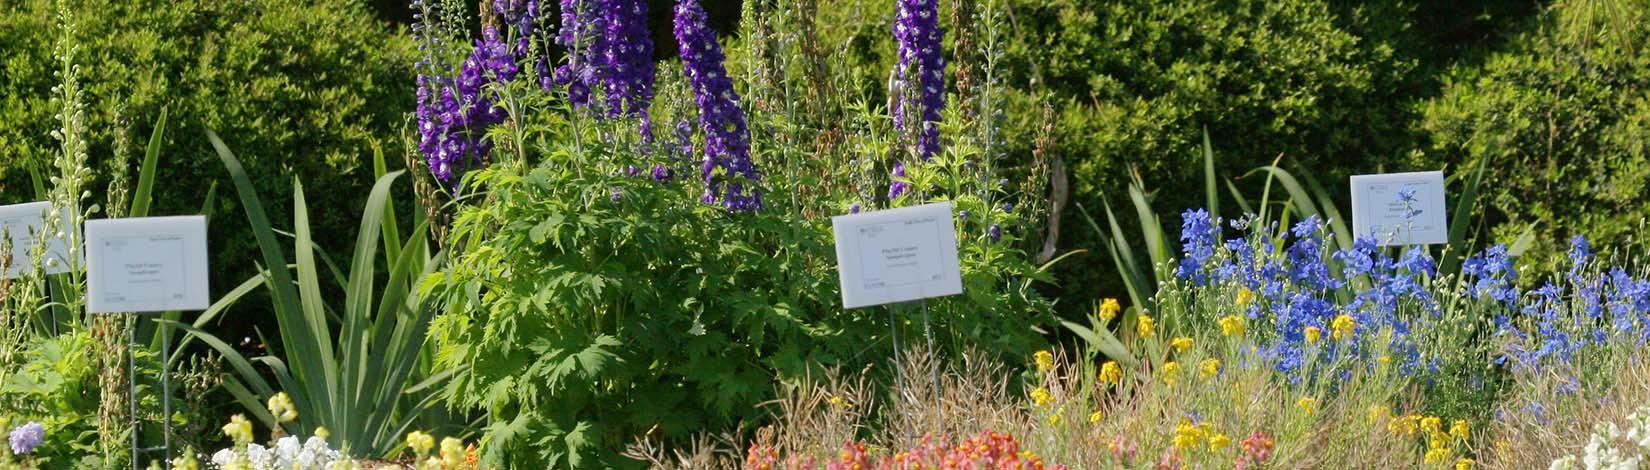 Florida Gardening Calendar - UF/IFAS Extension